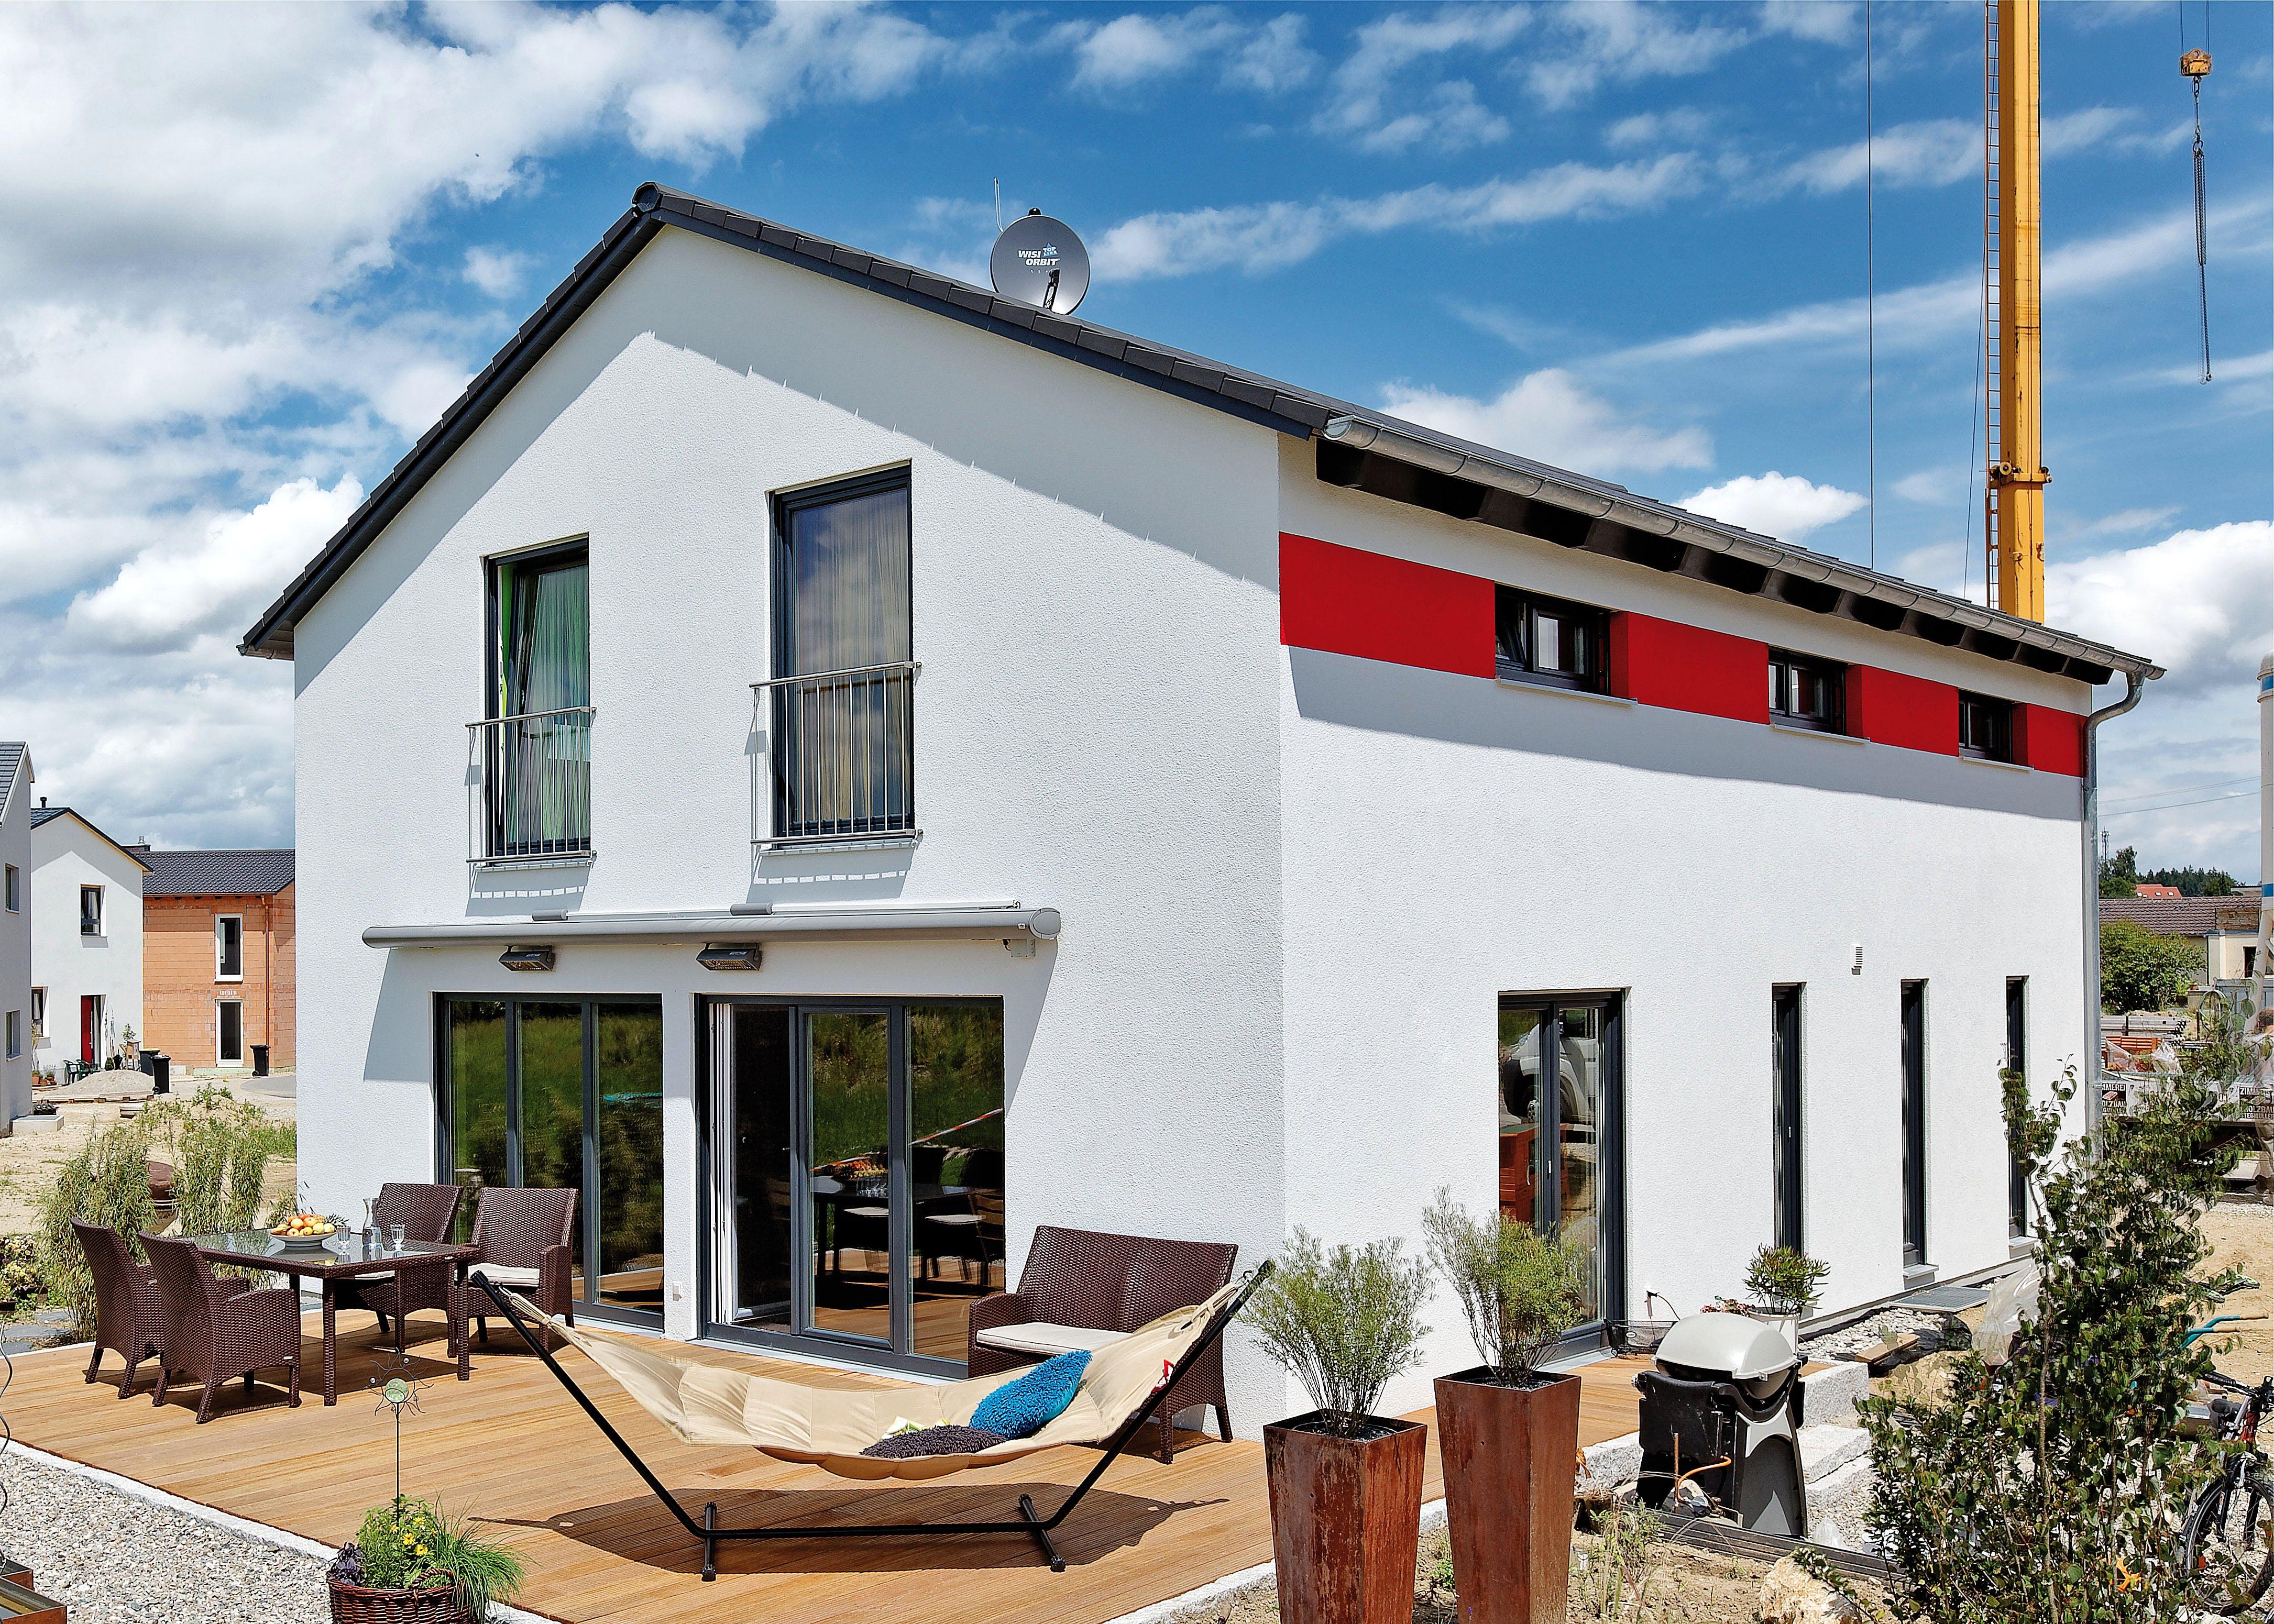 beautiful fertighaus im landhaus stil huser preise anbieter infos with huser im stil - Fertighaus Huser Texas